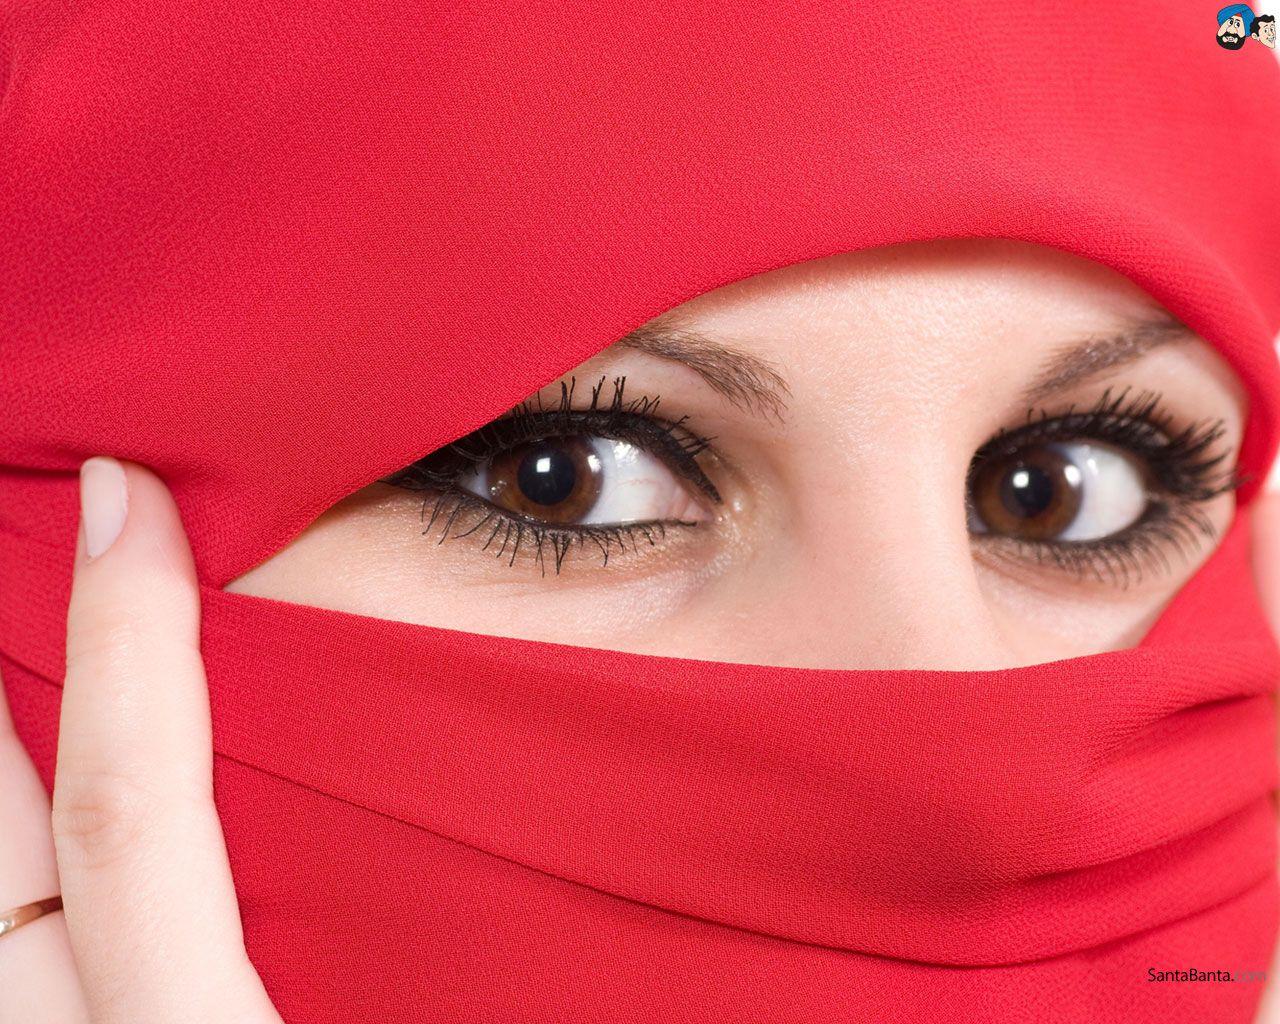 arabic girl wallpaper,face,skin,eyebrow,nose,red